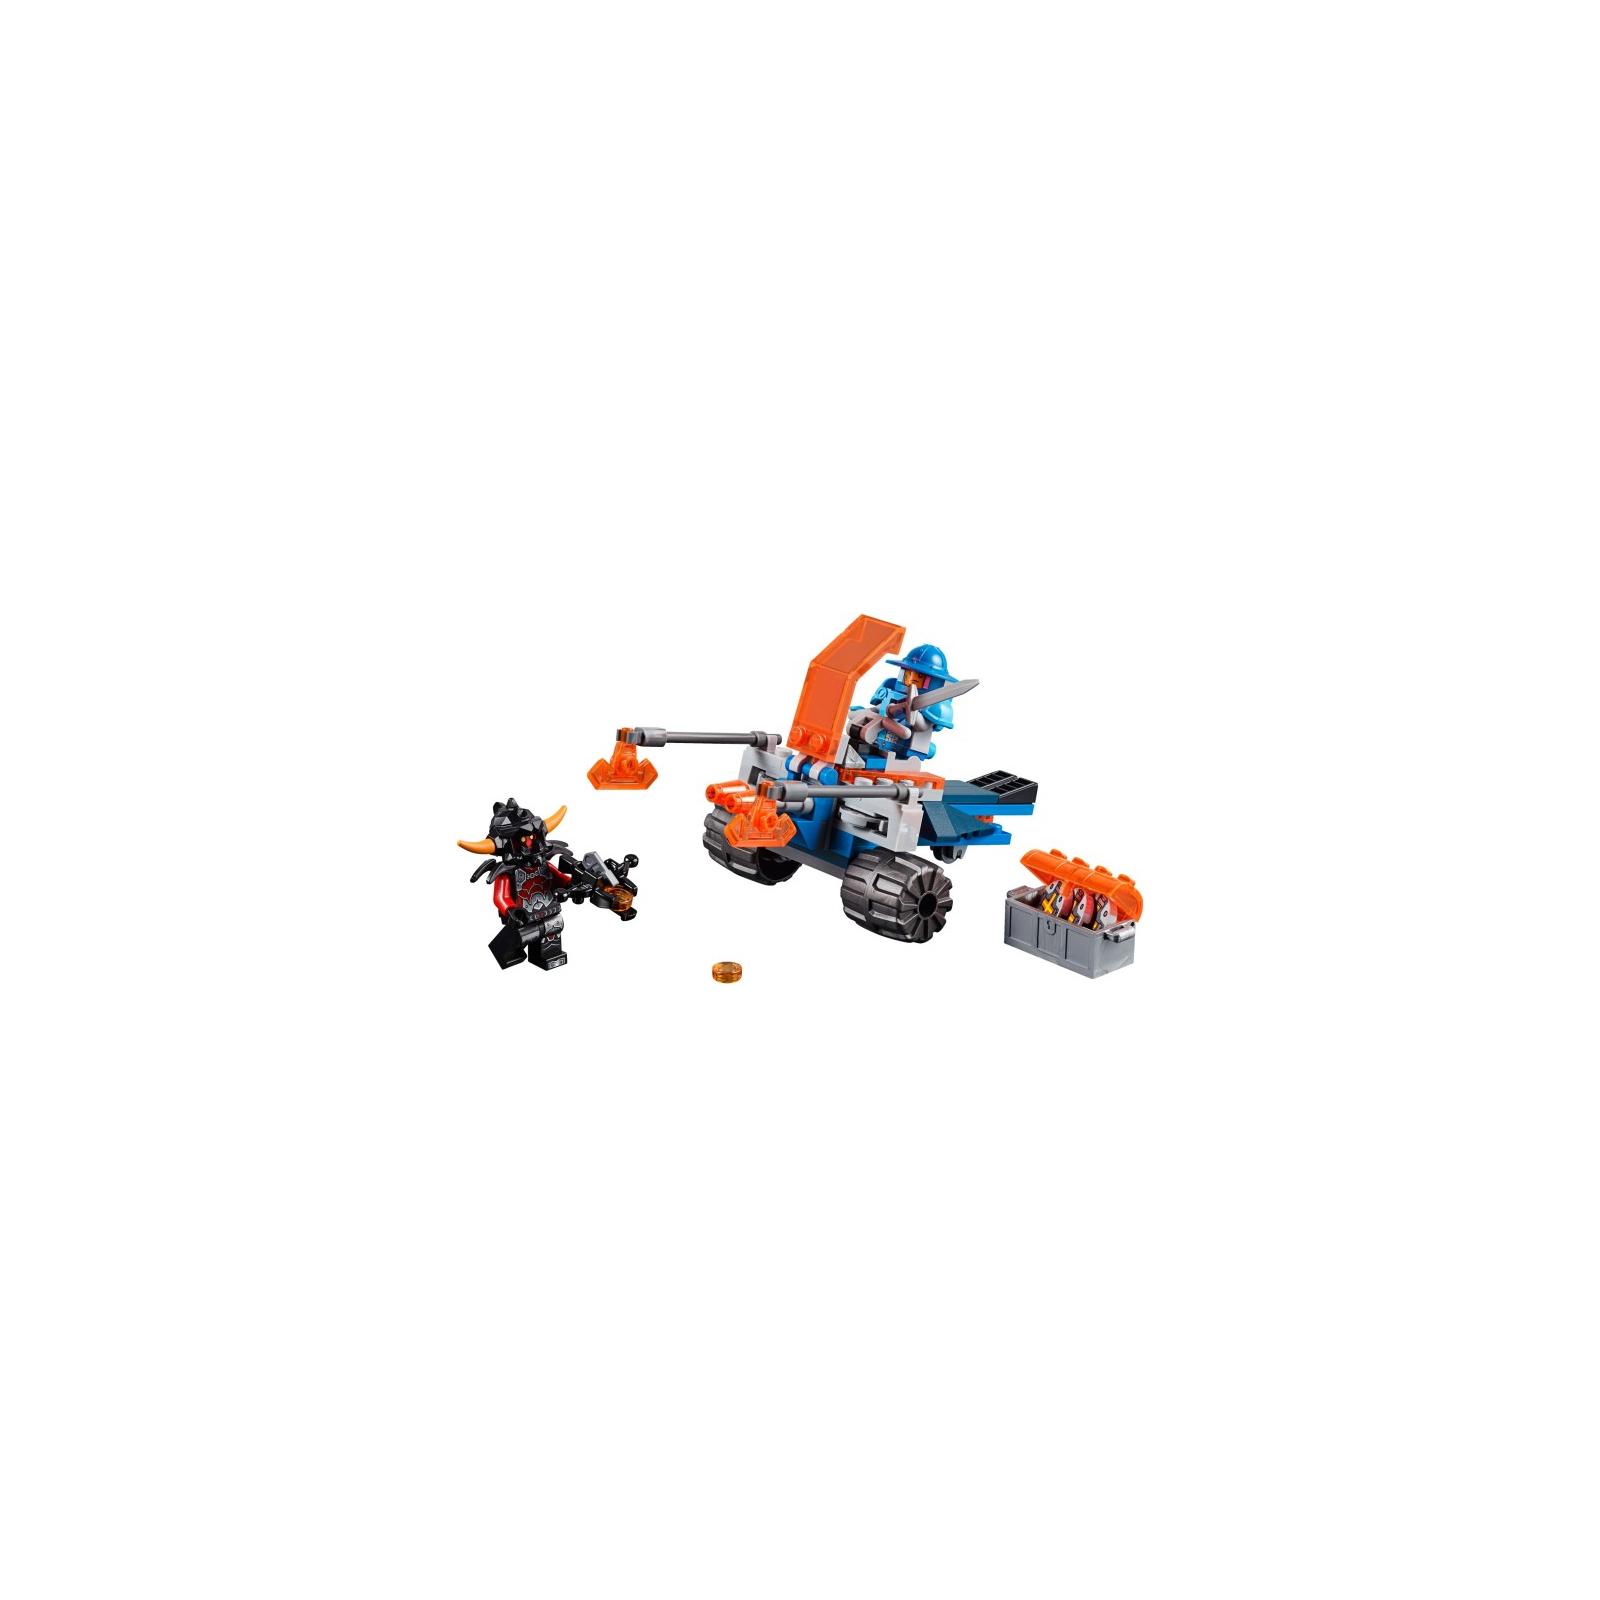 Конструктор LEGO Nexo Knights Королевский боевой бластер (70310) изображение 2